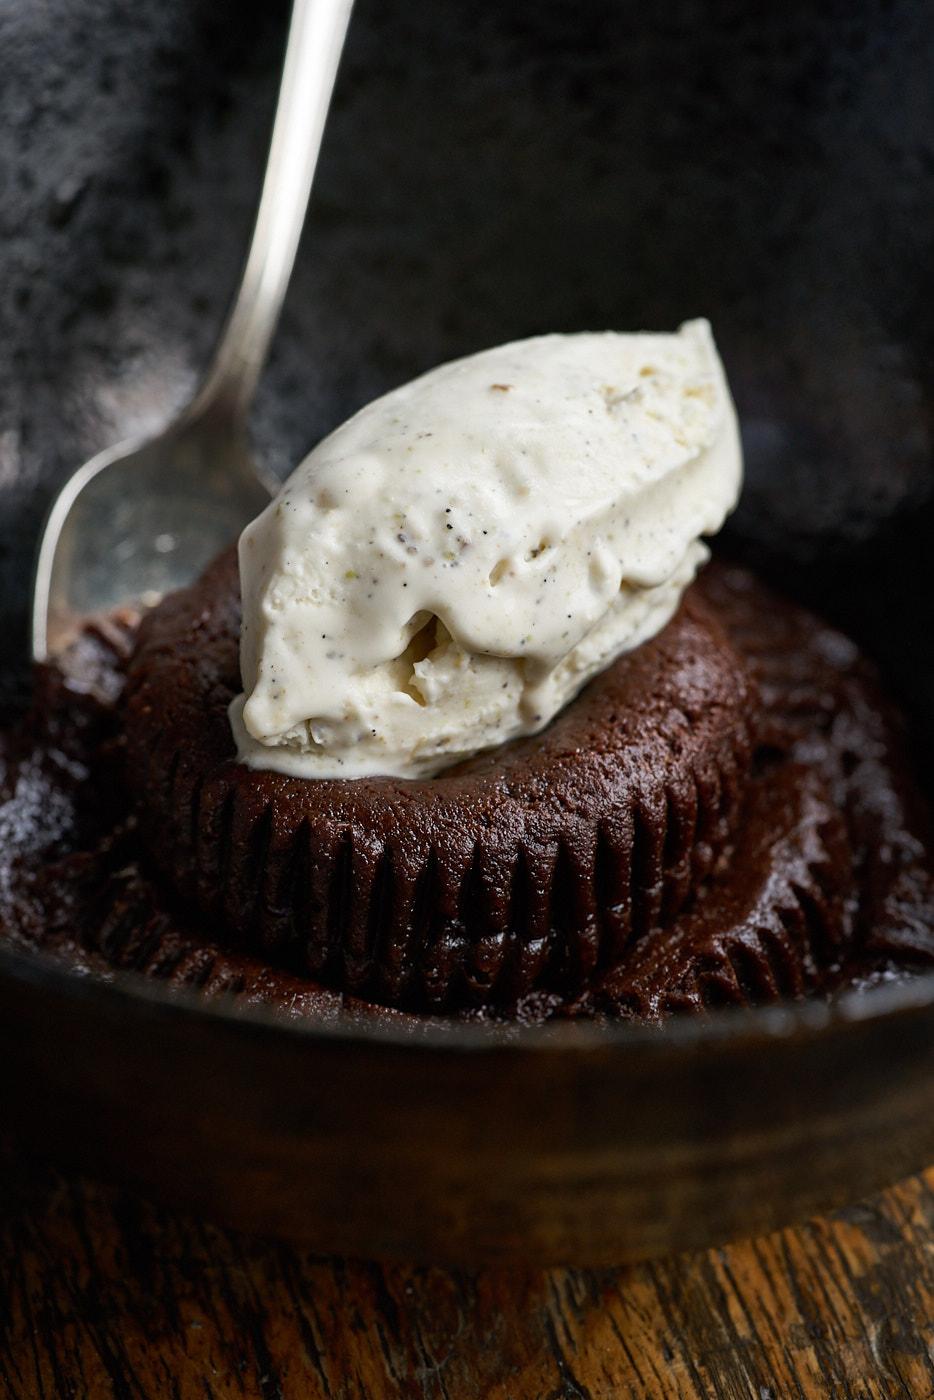 sweet dessert photography by Vadim Daniel photography